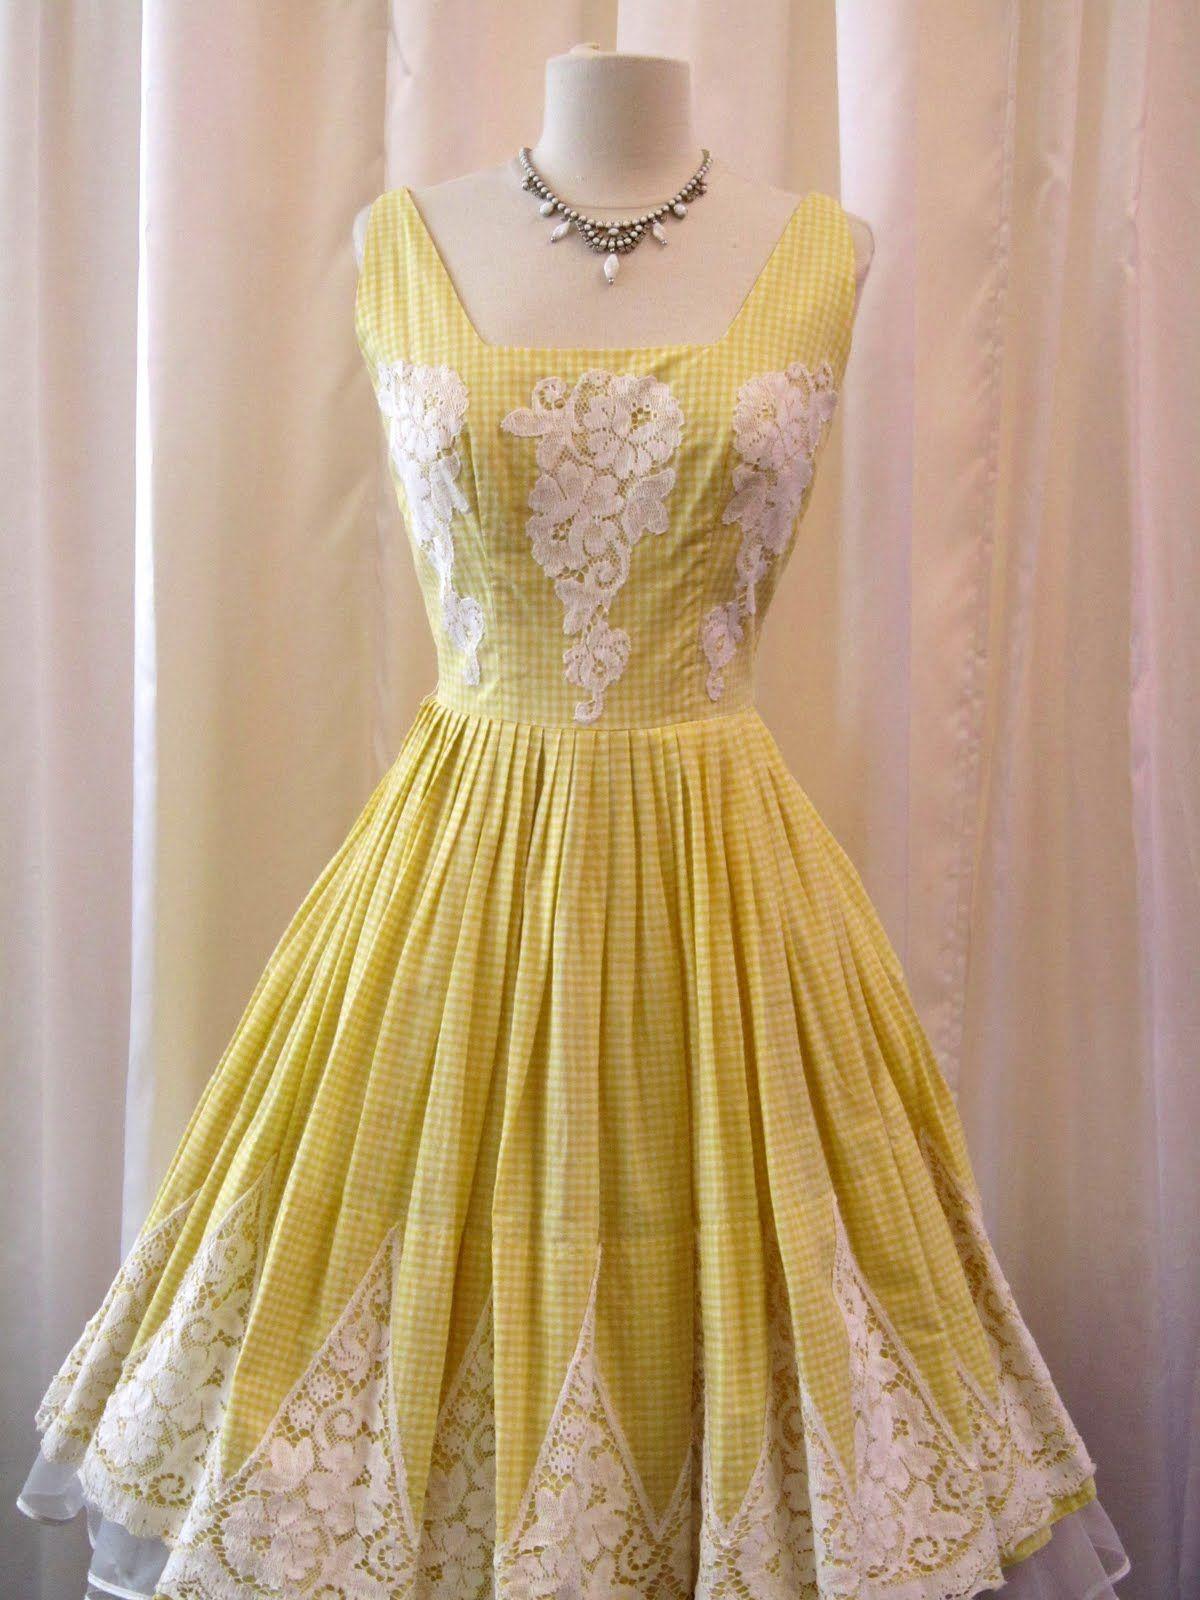 Vintage glamorous prom dresses